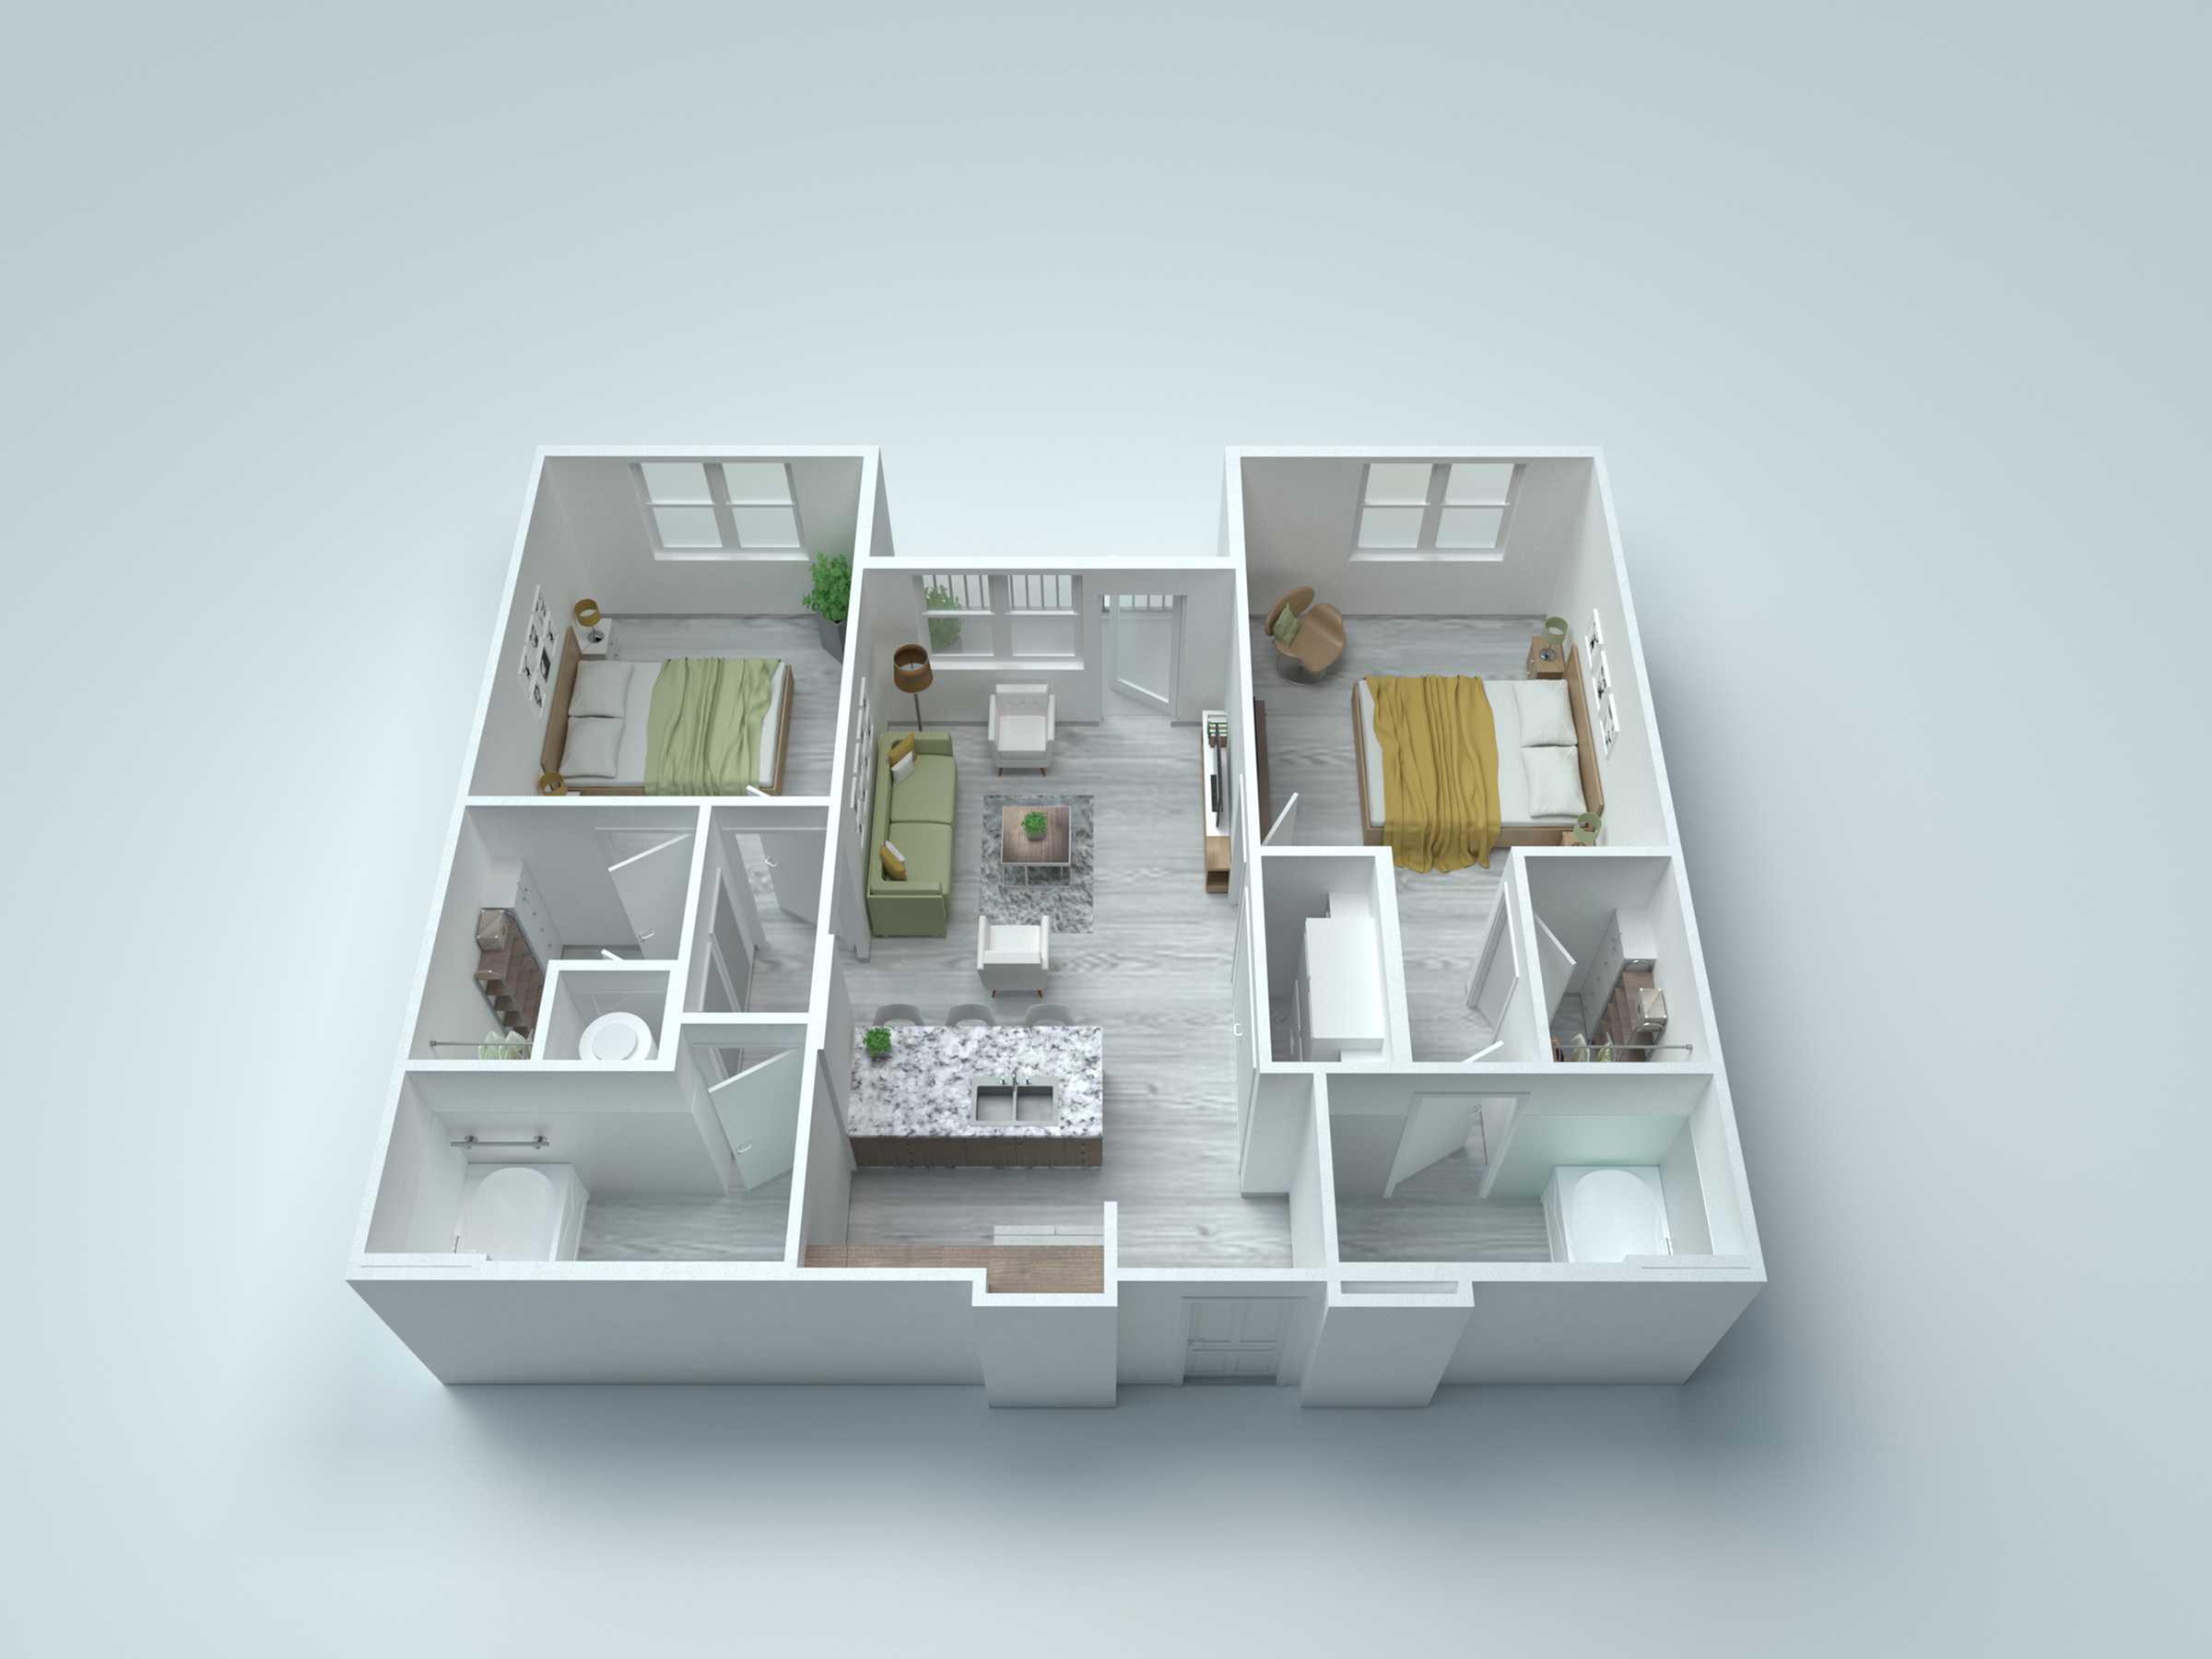 B1 Alt2 Floor Plan